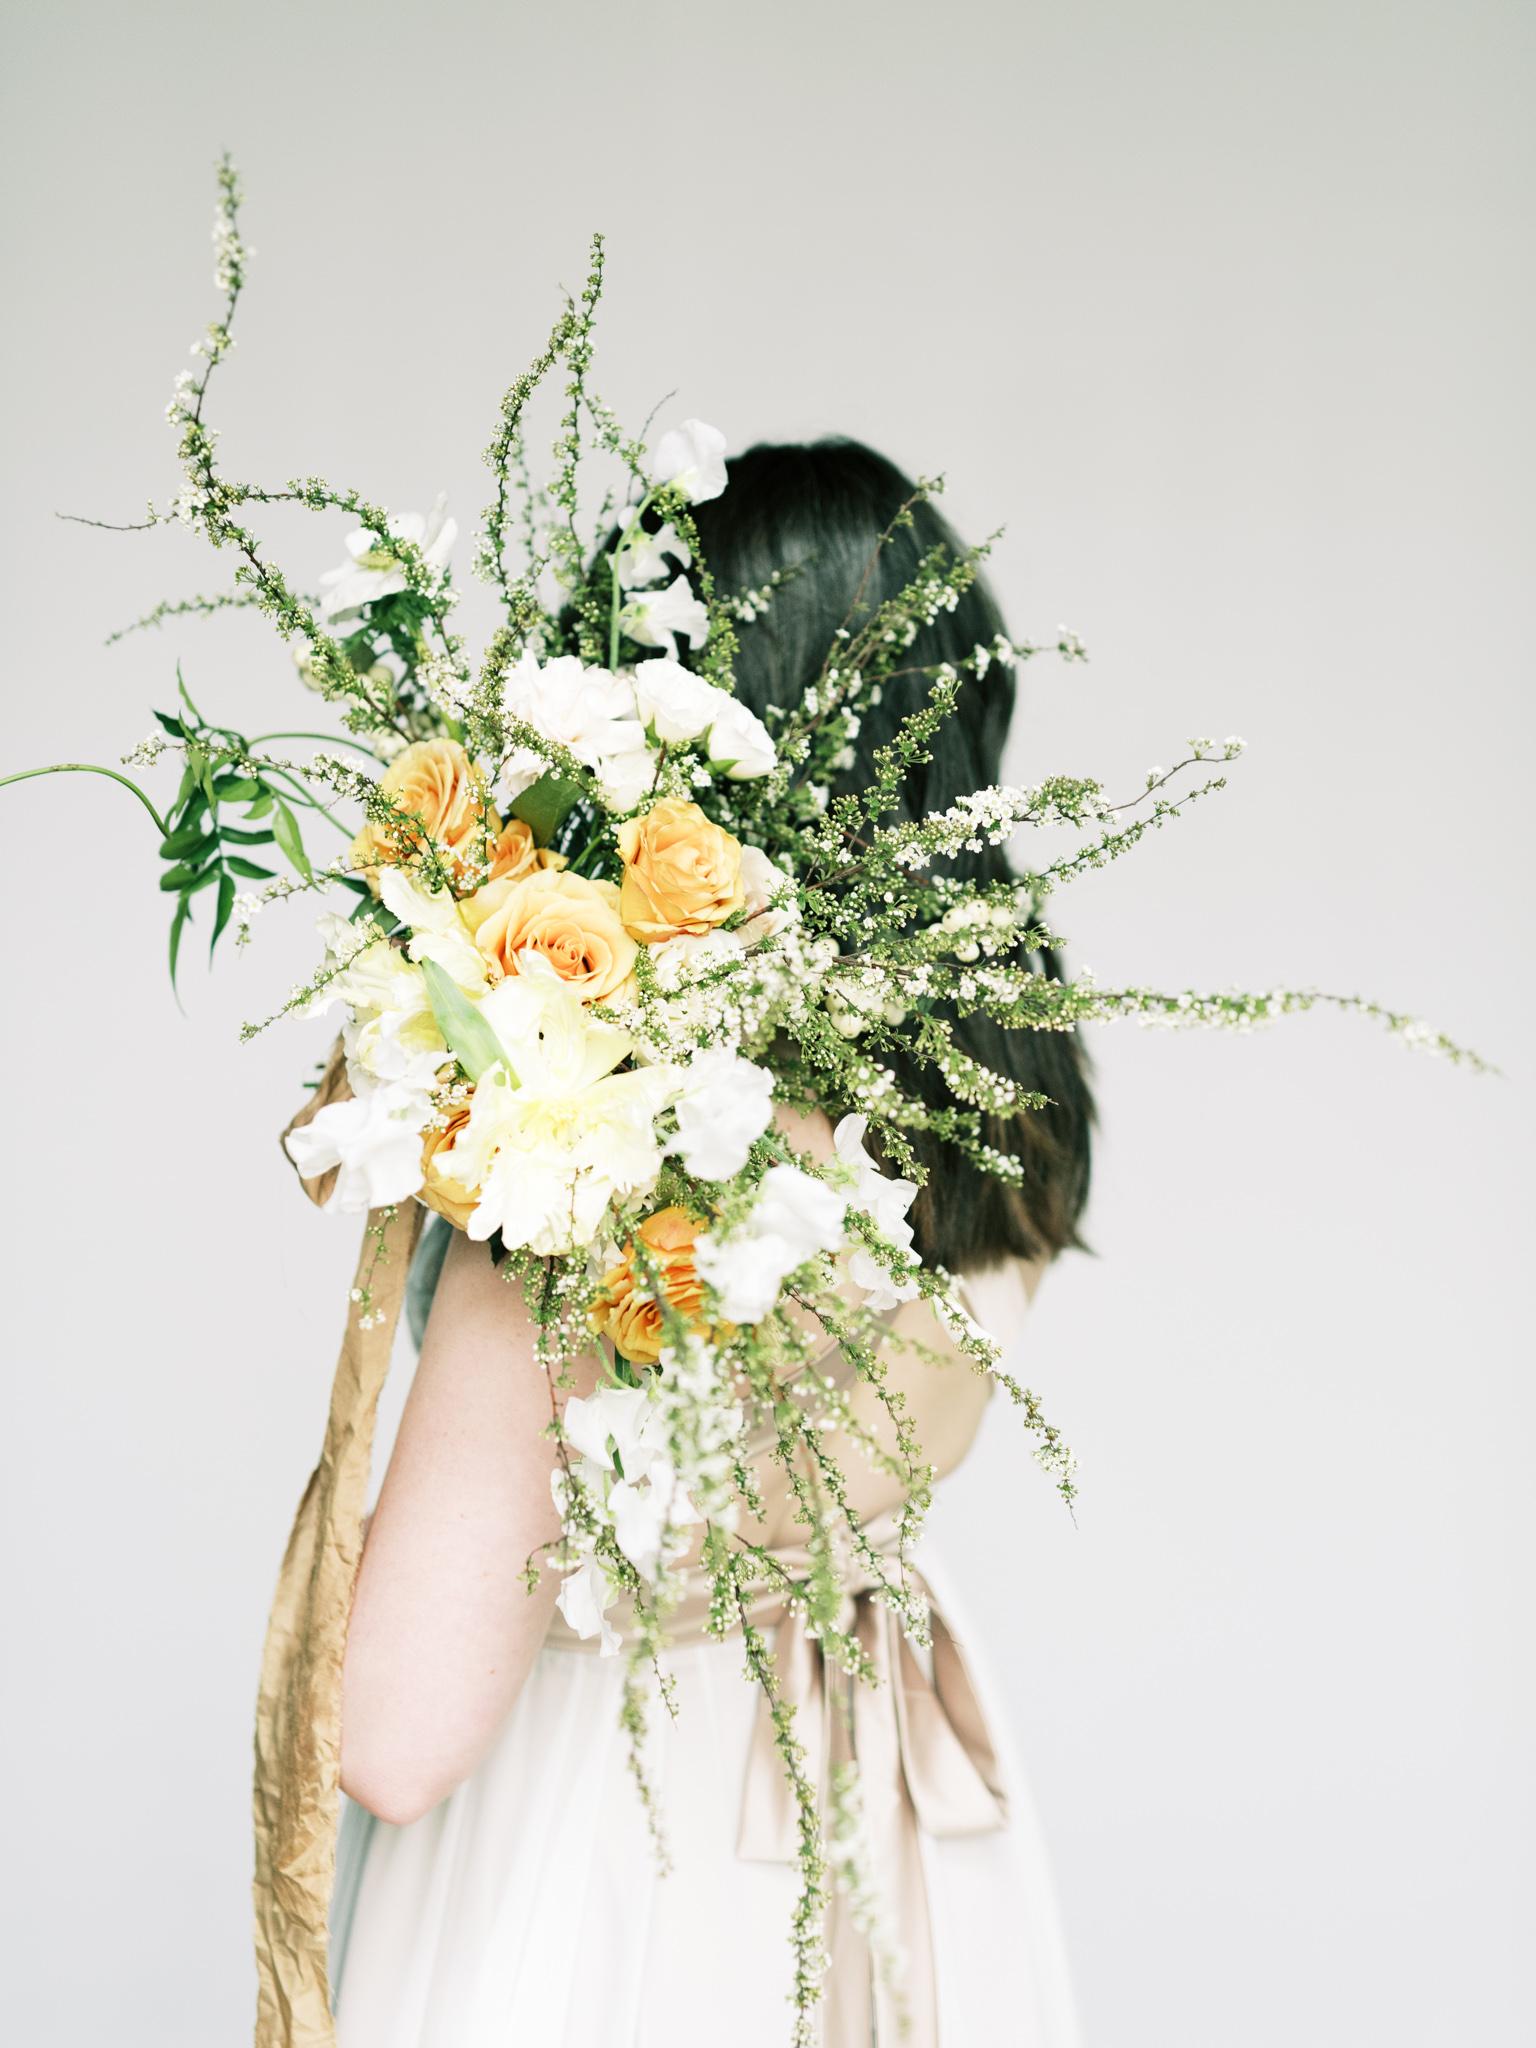 Cultivate Goods Floral Workshop - The Doyle - Kristen Krehbiel - Kristen Kay Photography-141.jpg